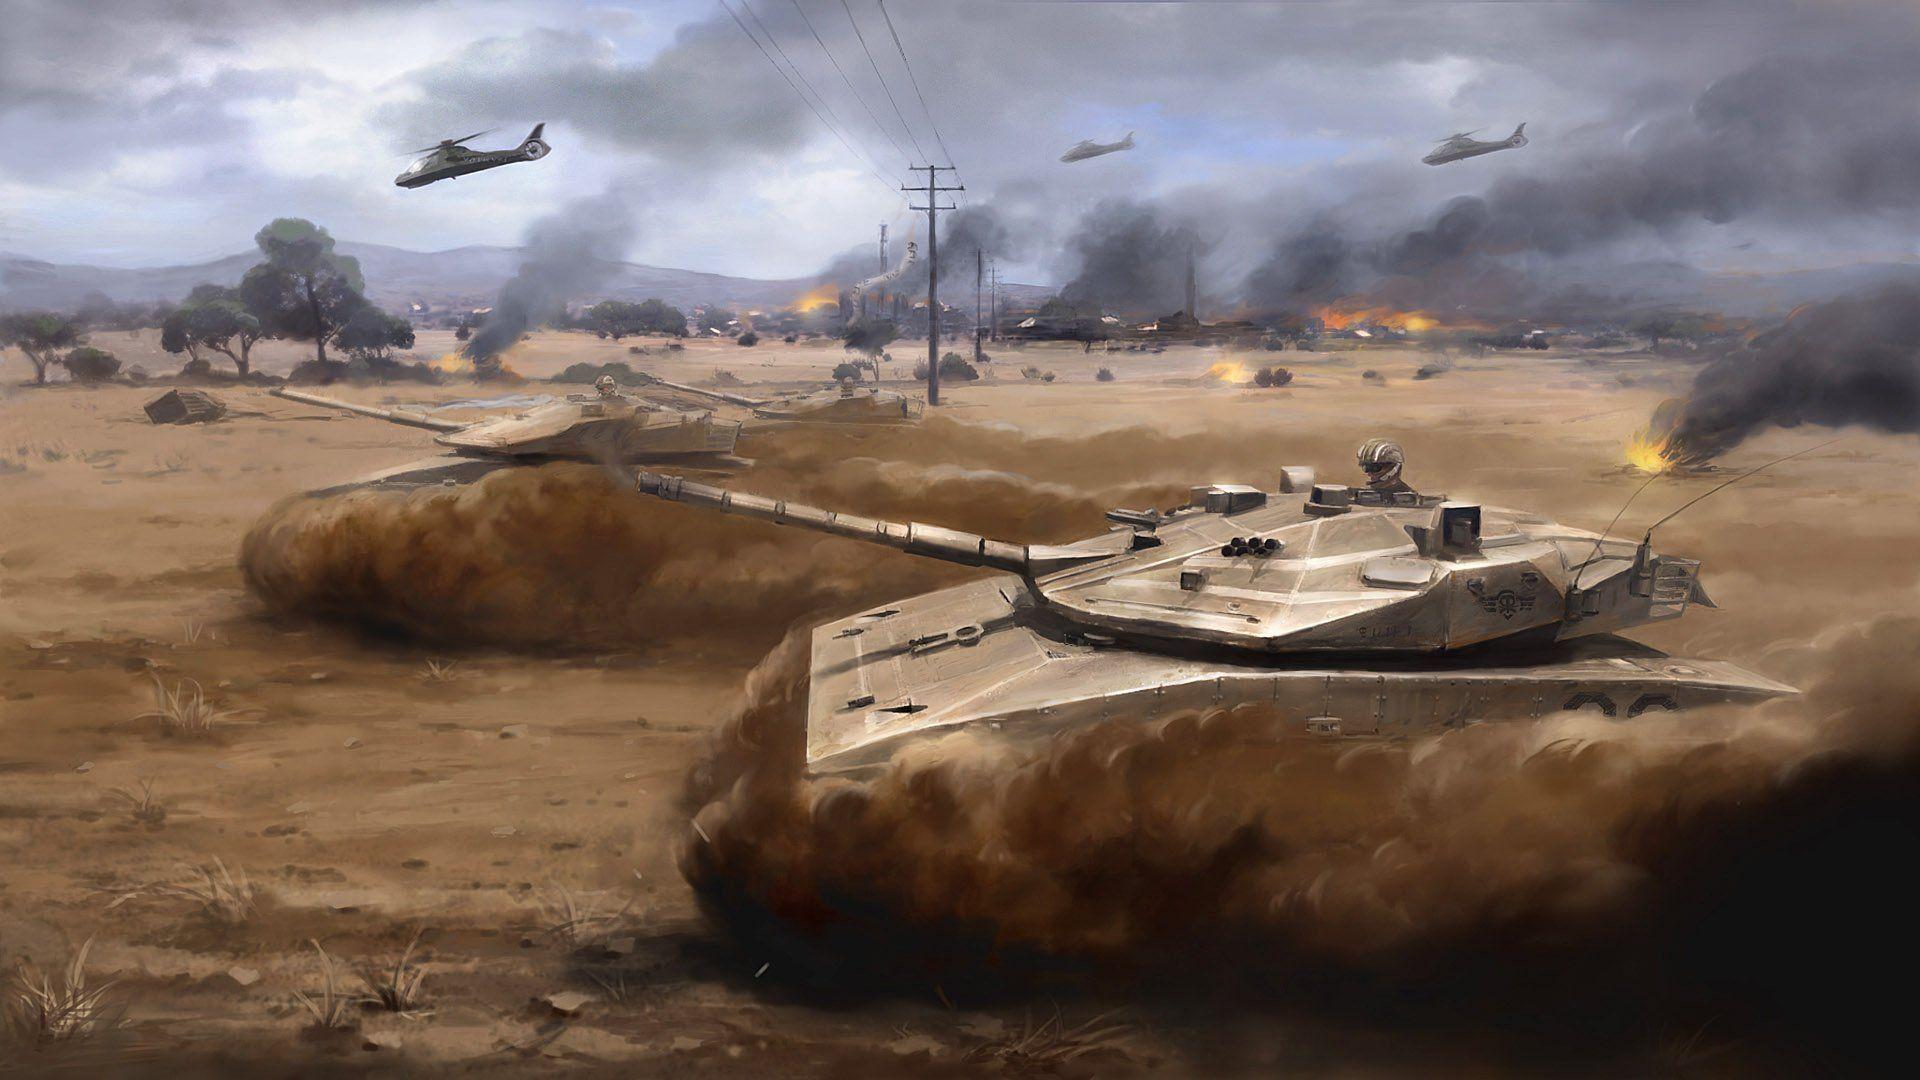 Arma 3 battle scene | Maquettes and Game Art | Arma 3, War machine